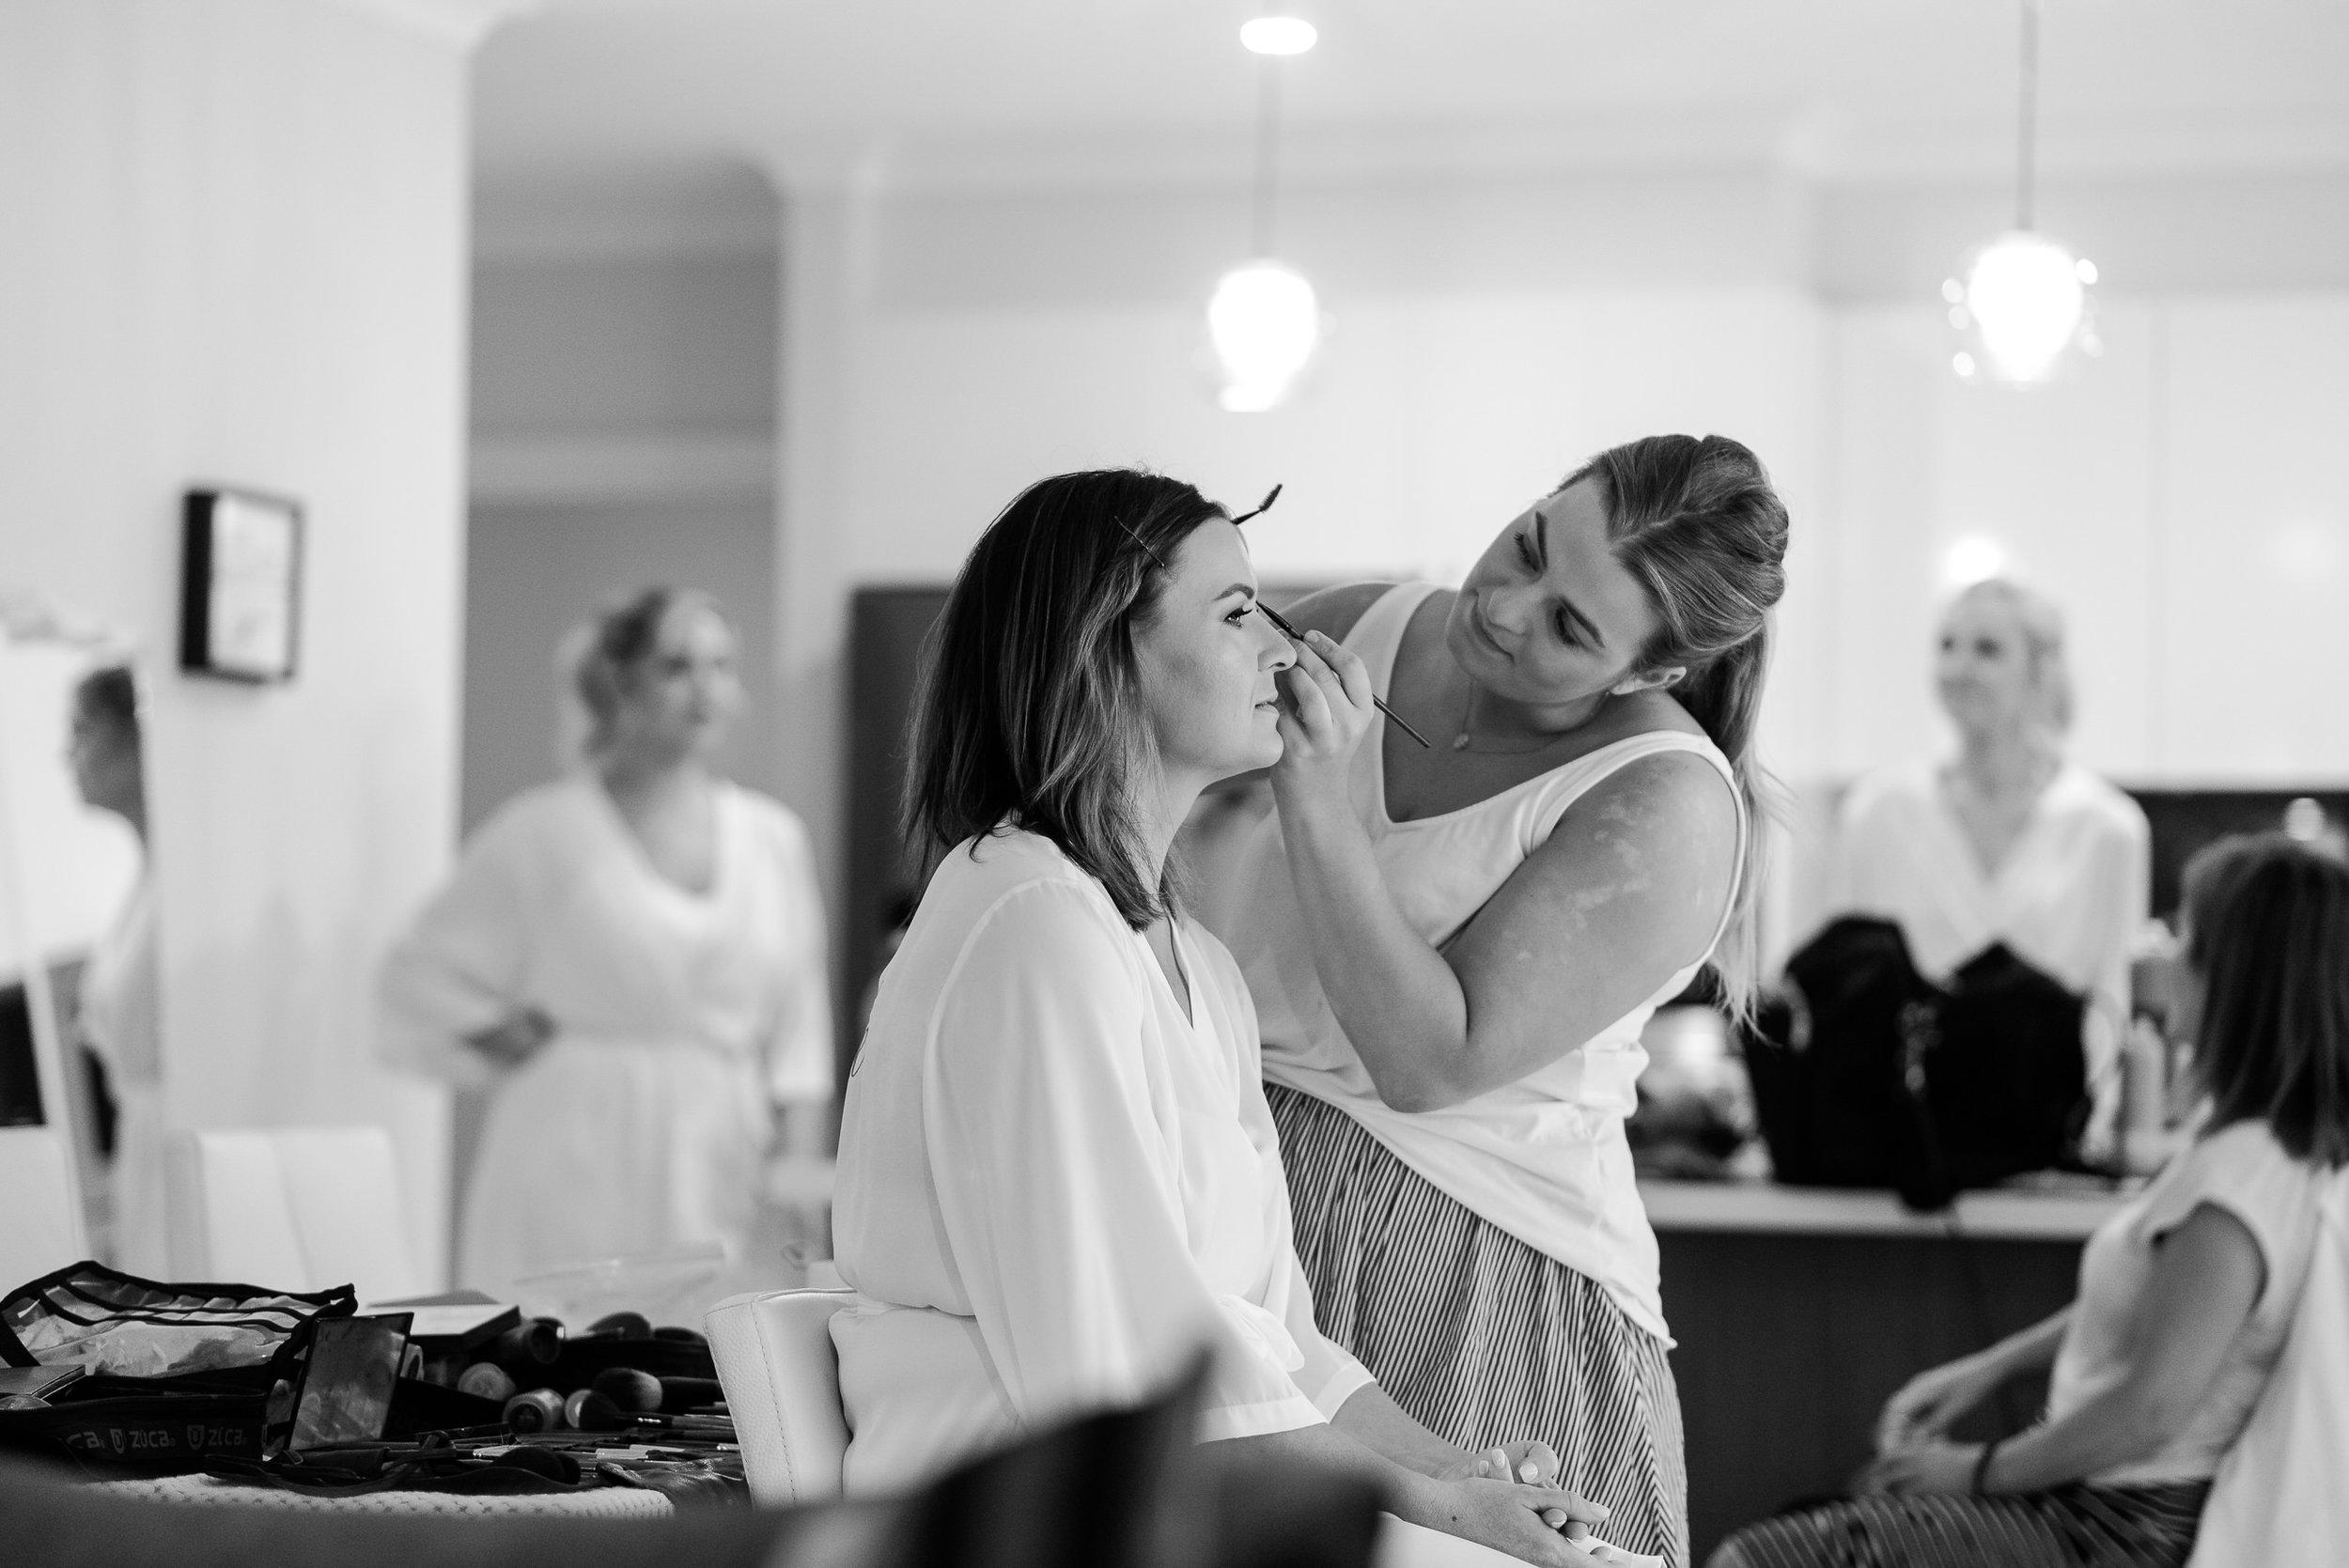 Justin_And_Jim_Photography_Chateau_Dore_Bendigo_Wedding2.JPG